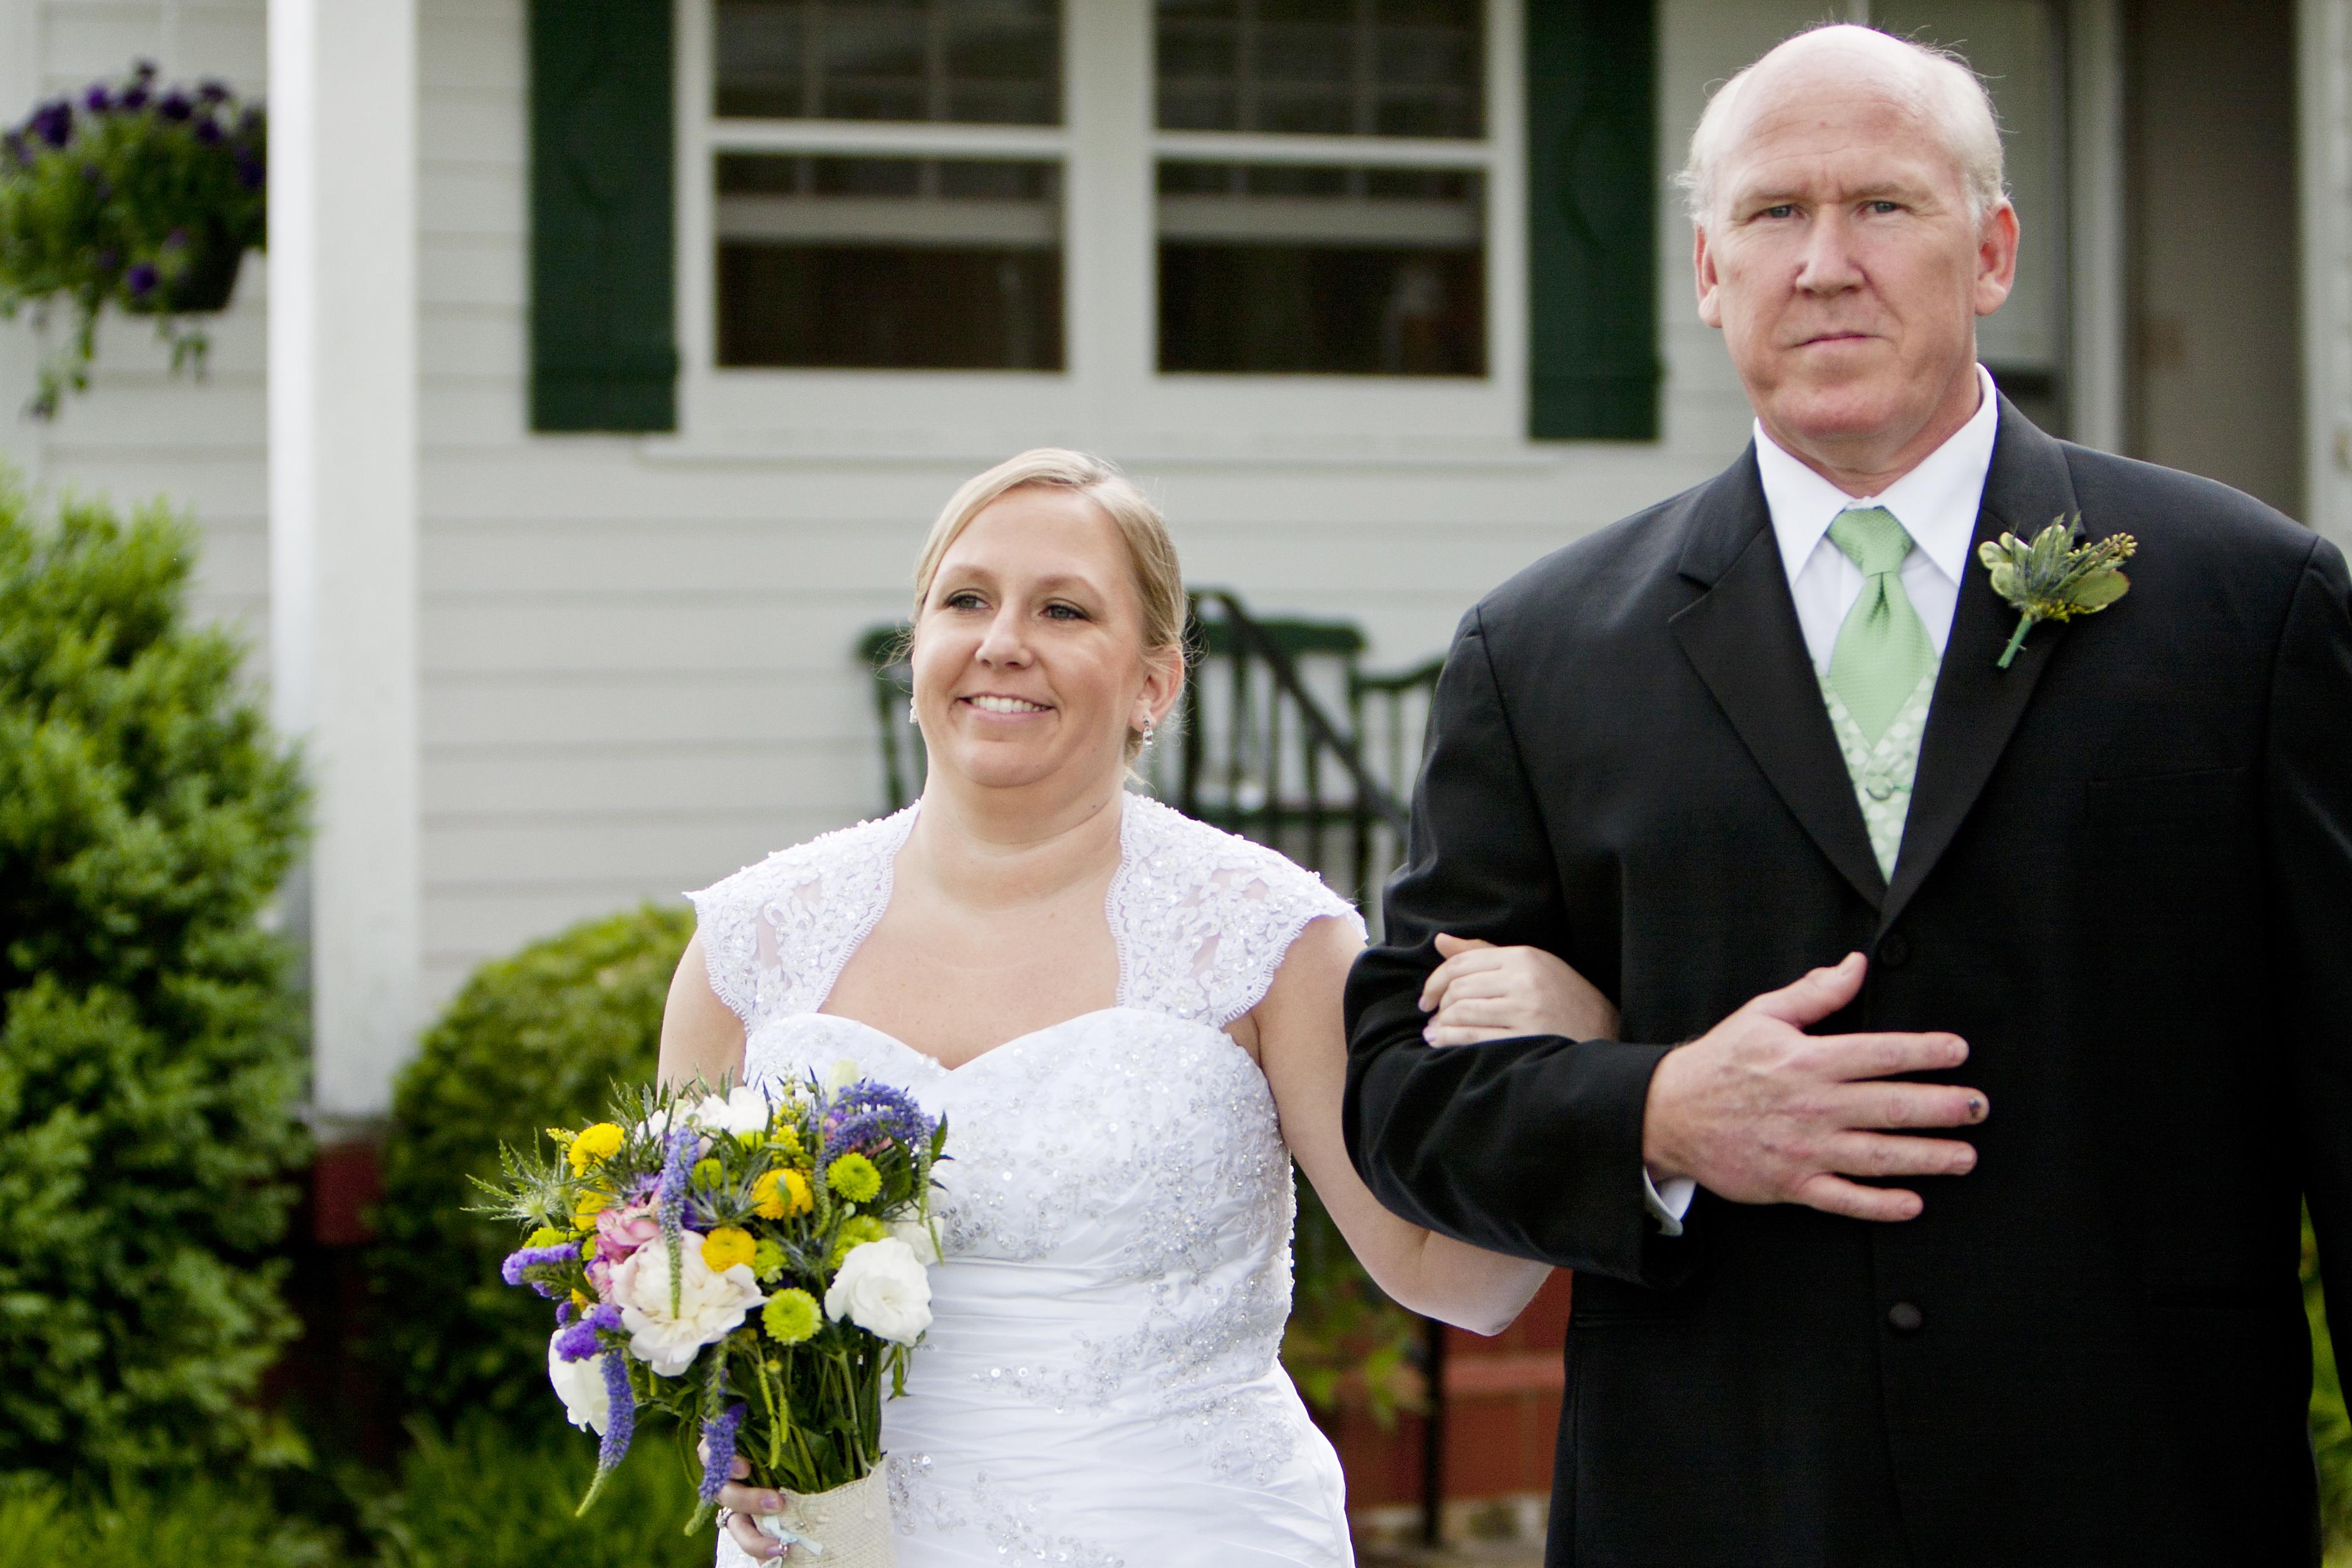 Flowers & Decor, Wedding Dresses, Rustic Vineyard Wedding Dresses, Fashion, green, dress, Rustic, Flowers, Apple, rustic wedding dresses, Flower Wedding Dresses